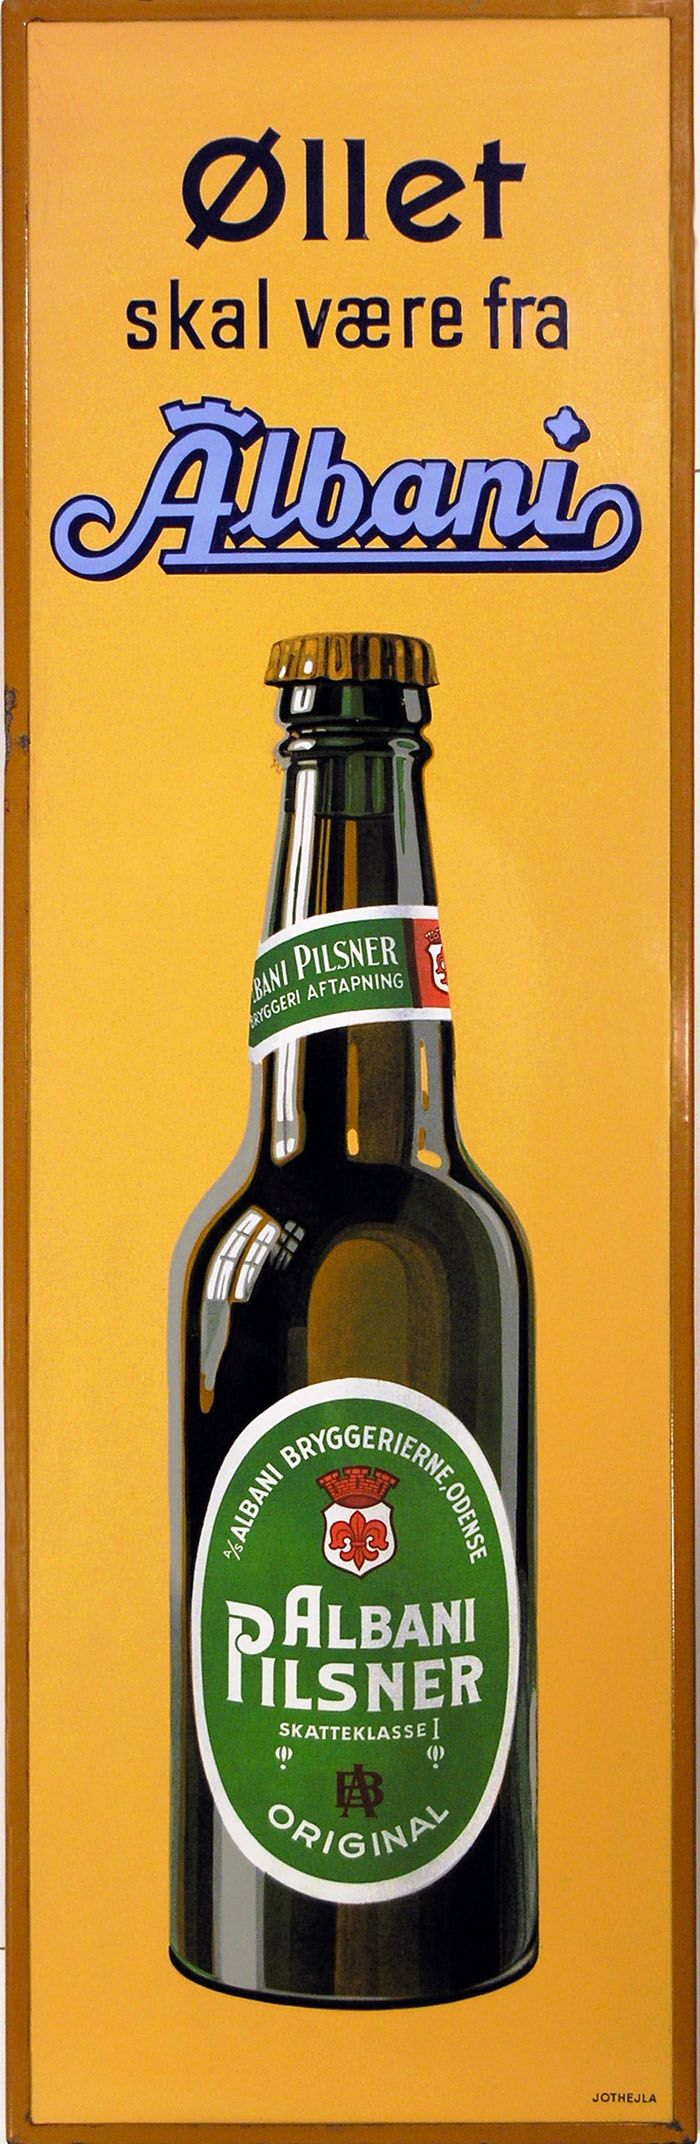 Albani øl